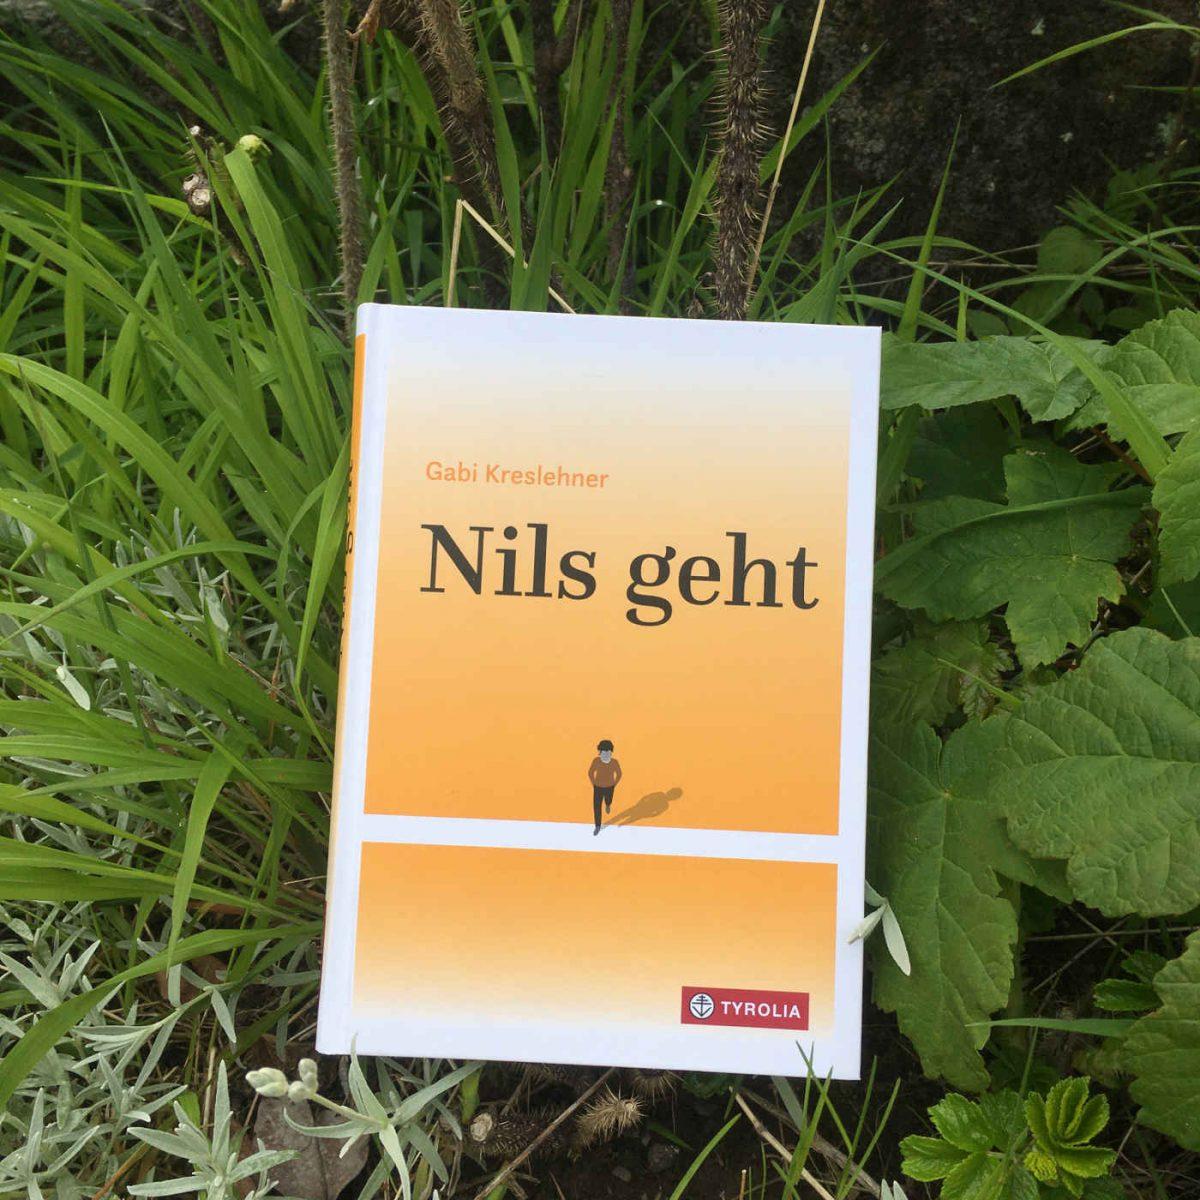 Gabi Kreslehner: Nils geht